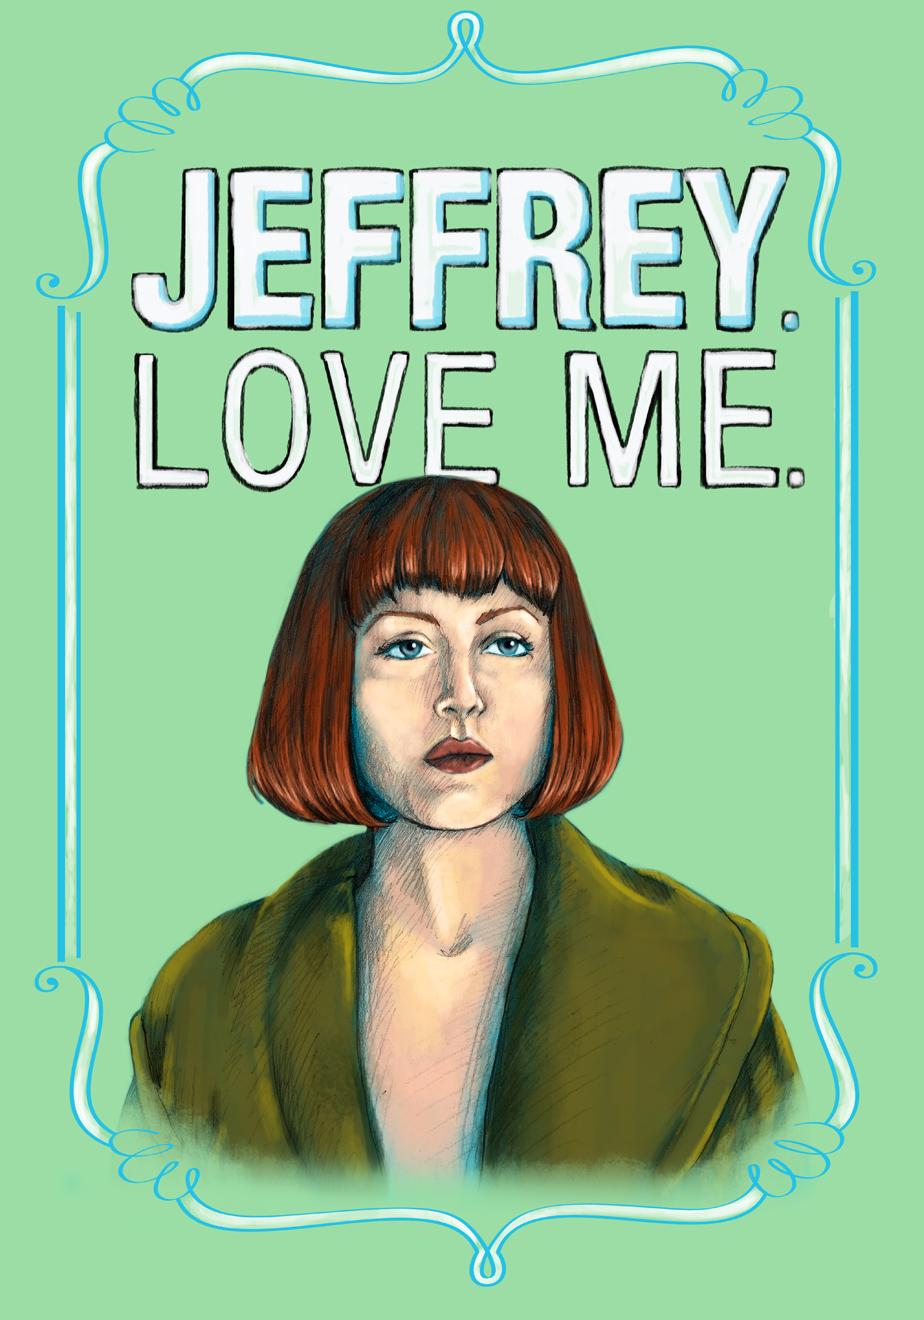 """Jeffrey.Love me."" Maude Lebowski from The Big Lebowski"